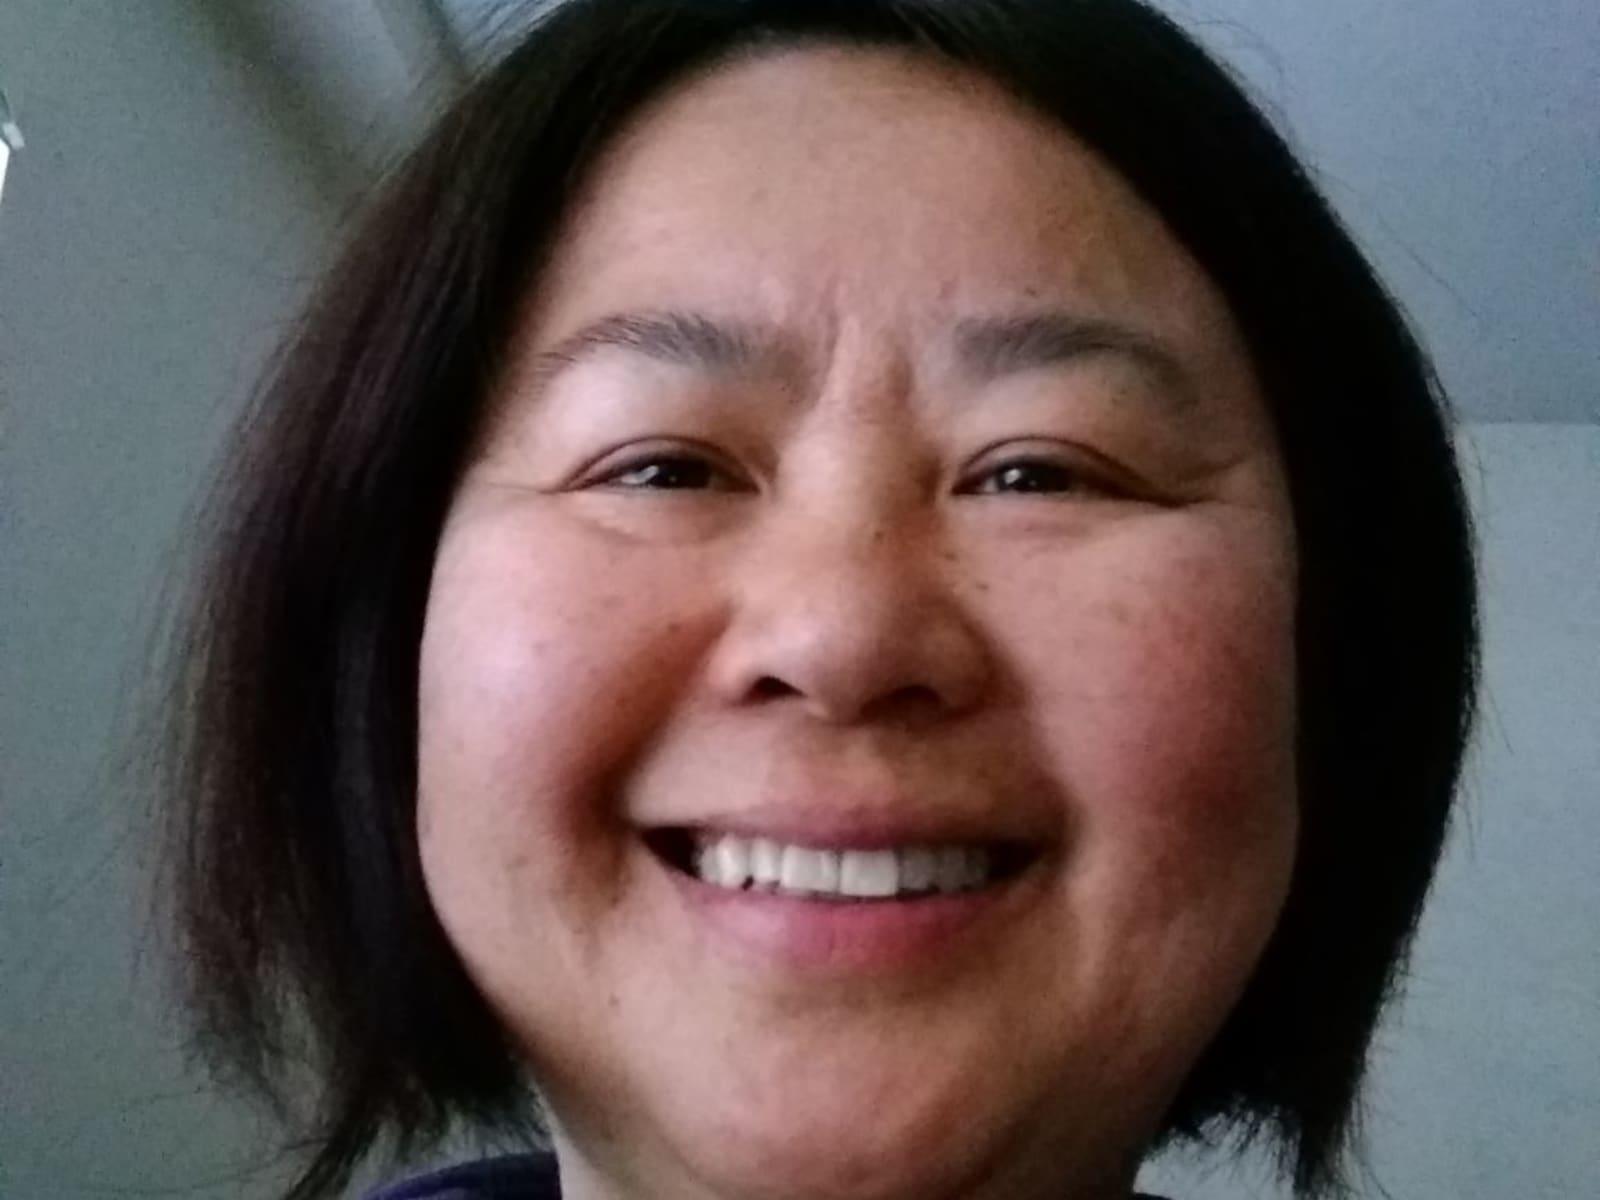 Kieu-trinh from Seattle, Washington, United States